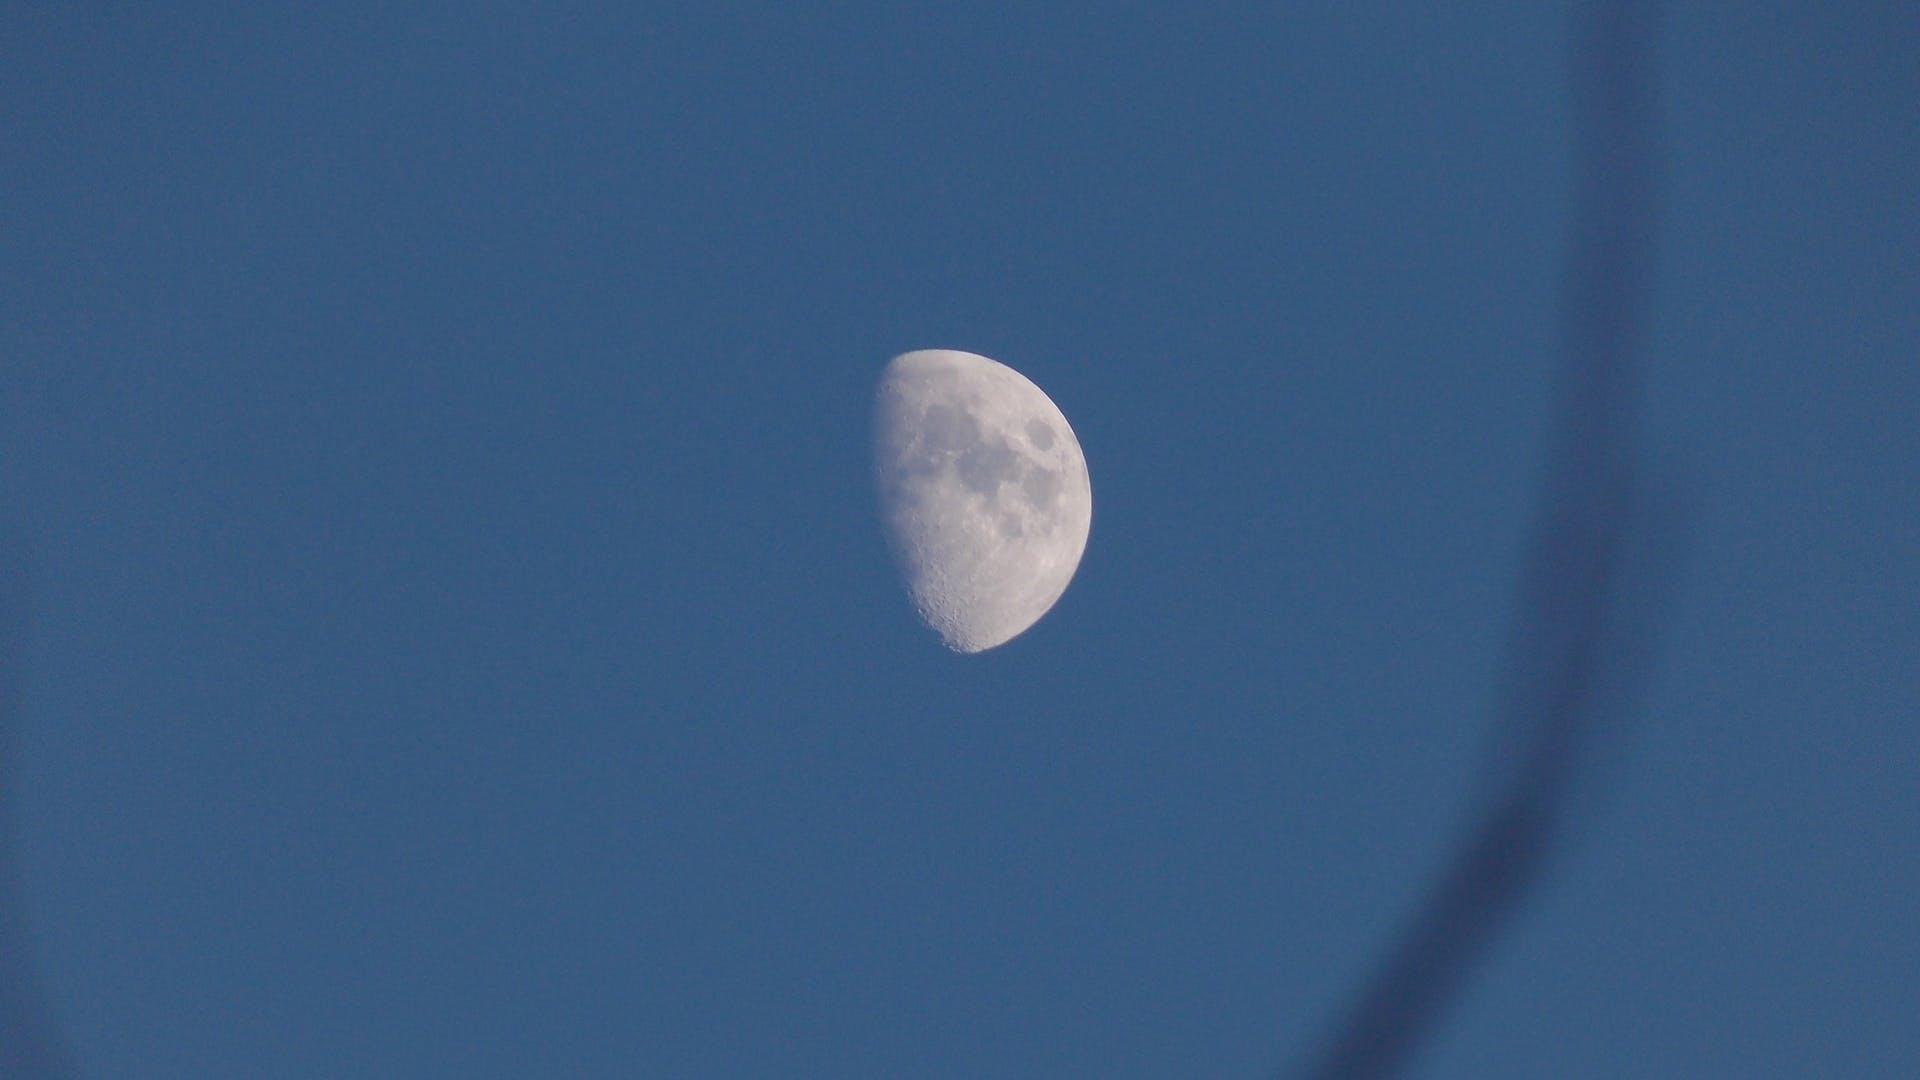 Free stock photo of moon